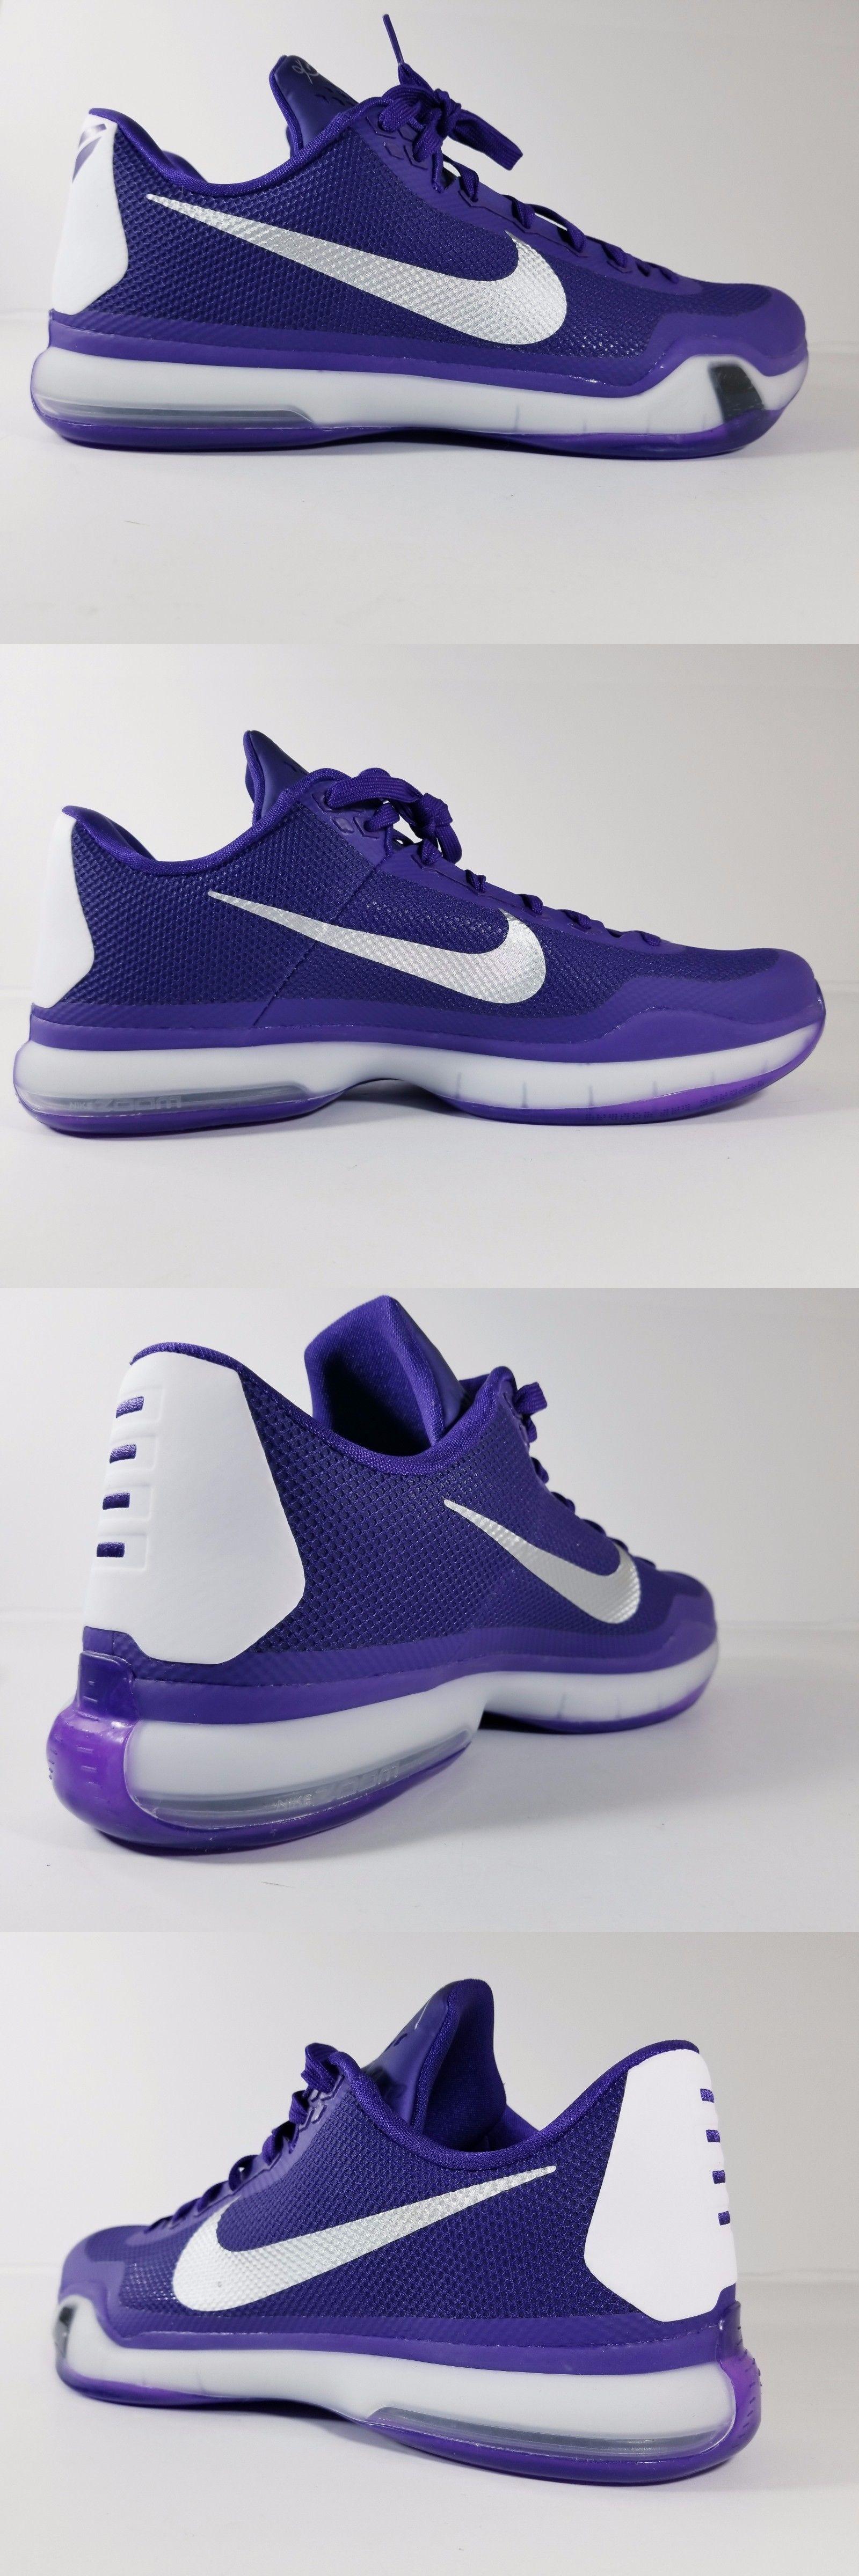 quality design 57c7e 6a5fb ... Men 158971 Nike Men S Kobe X 10 Tb Basketball Shoes Sz (813030- ...